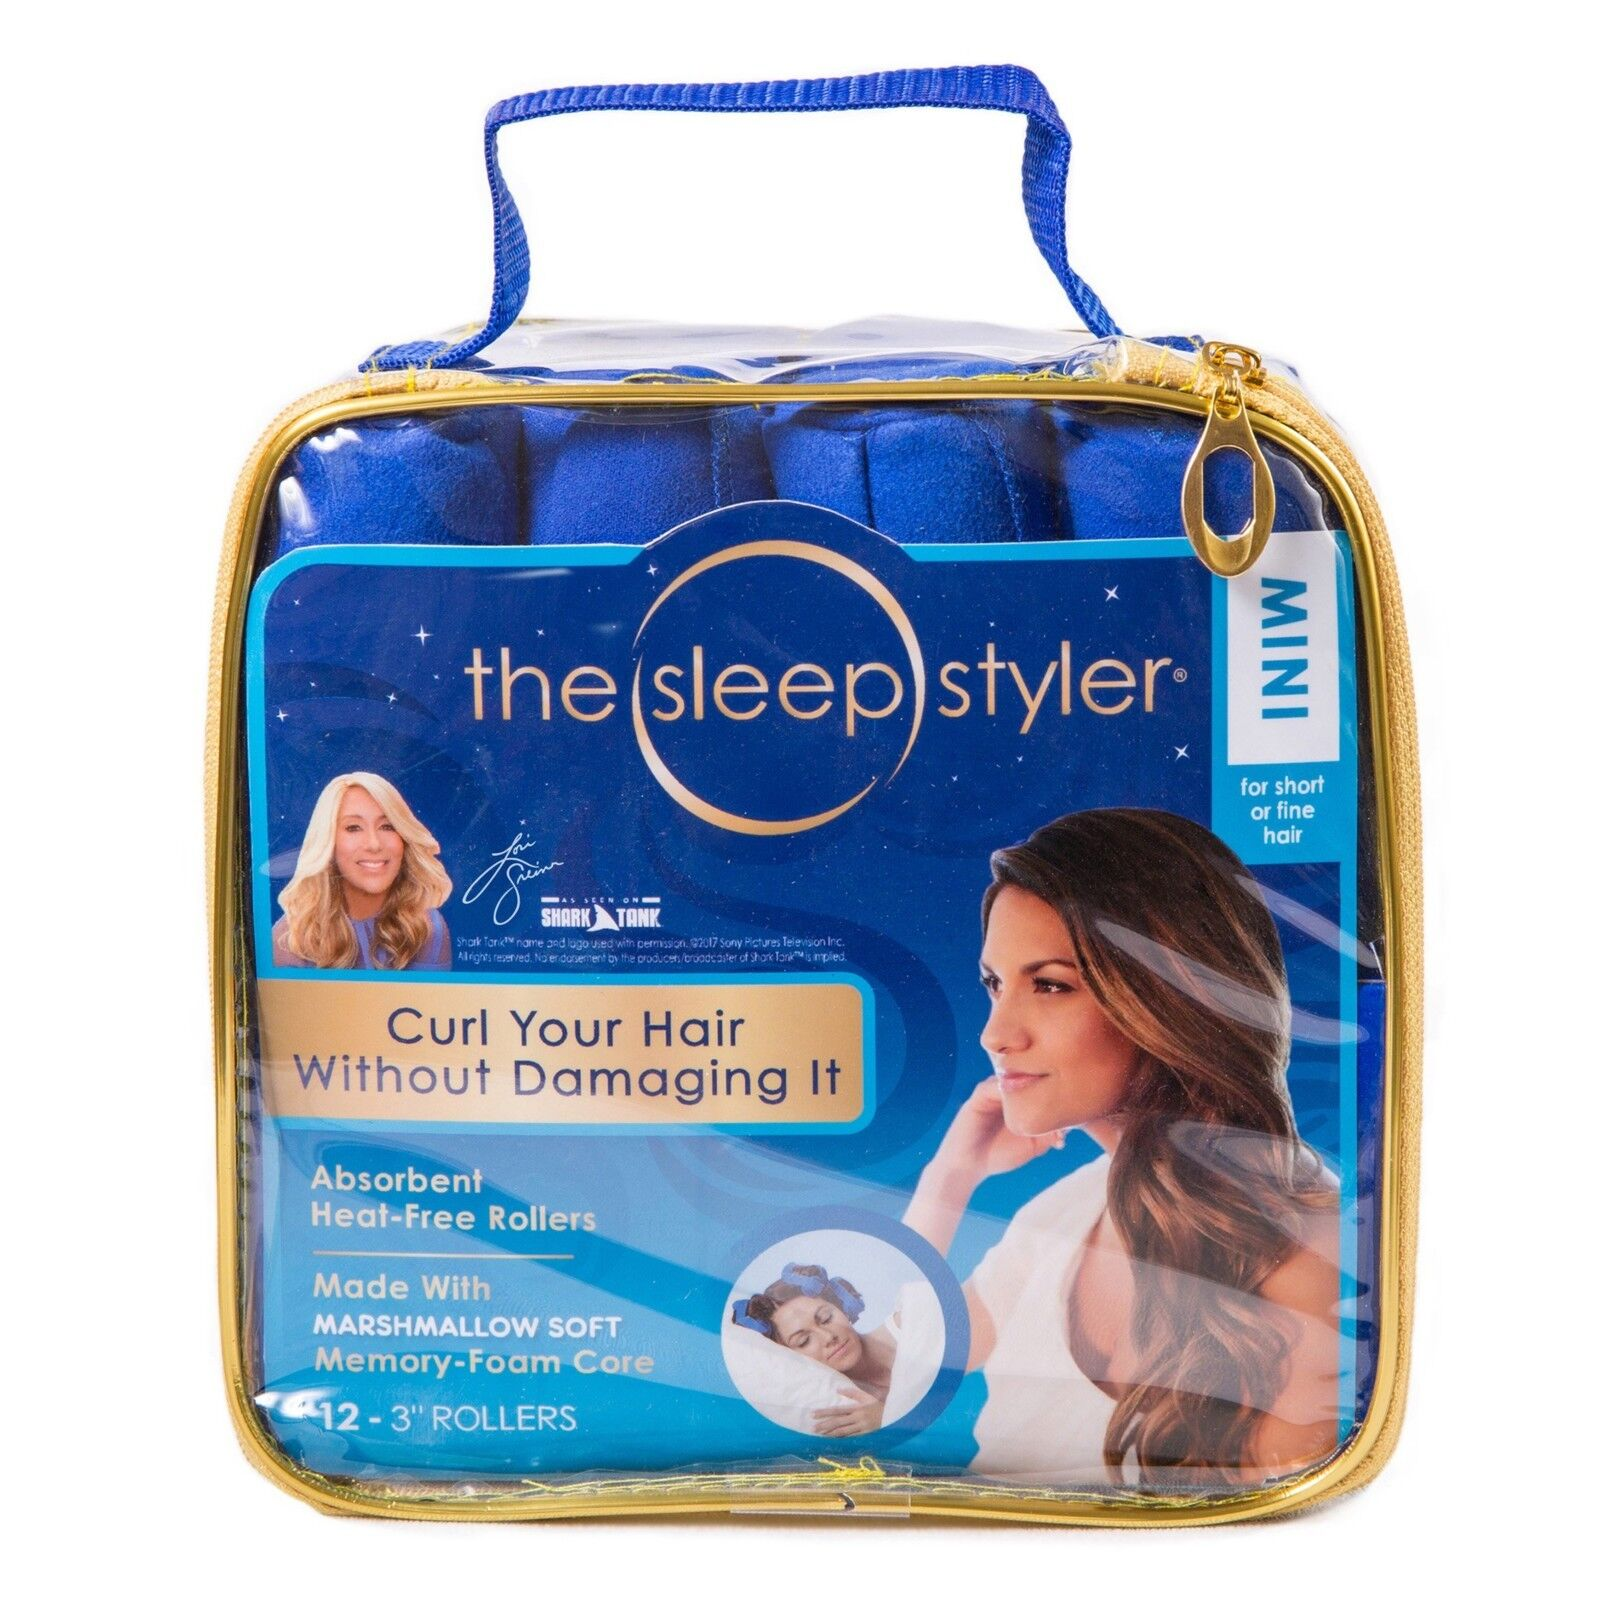 Sleep Night time Styler Hair NIP12 Curlers for Short or Long Fine Heat- Rollers